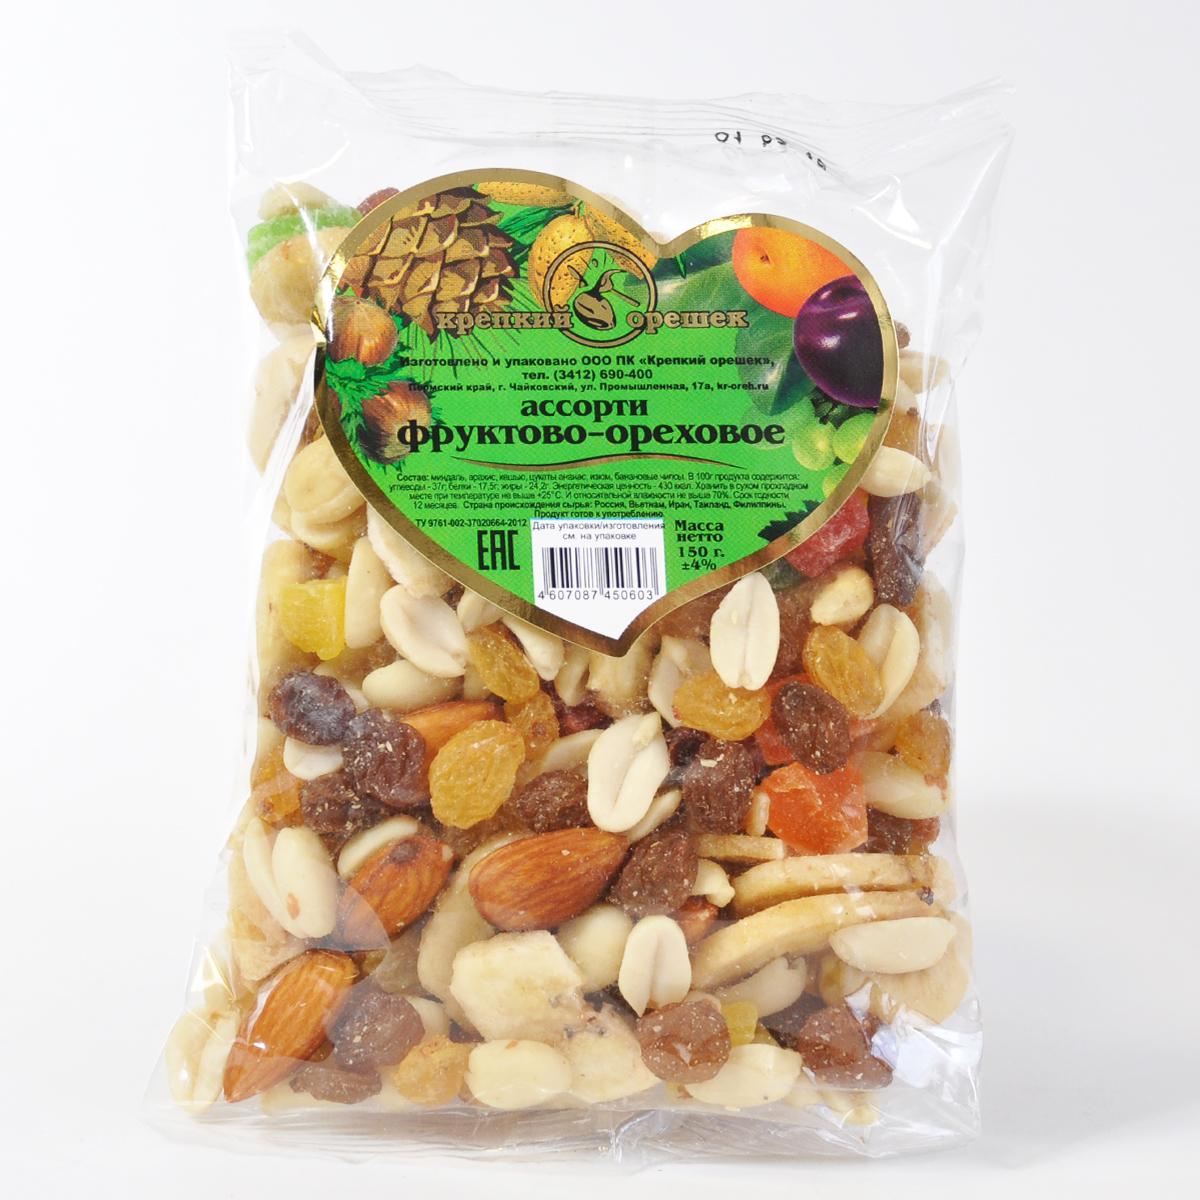 Ассорти фруктово-ореховое CEZONI 150 гр